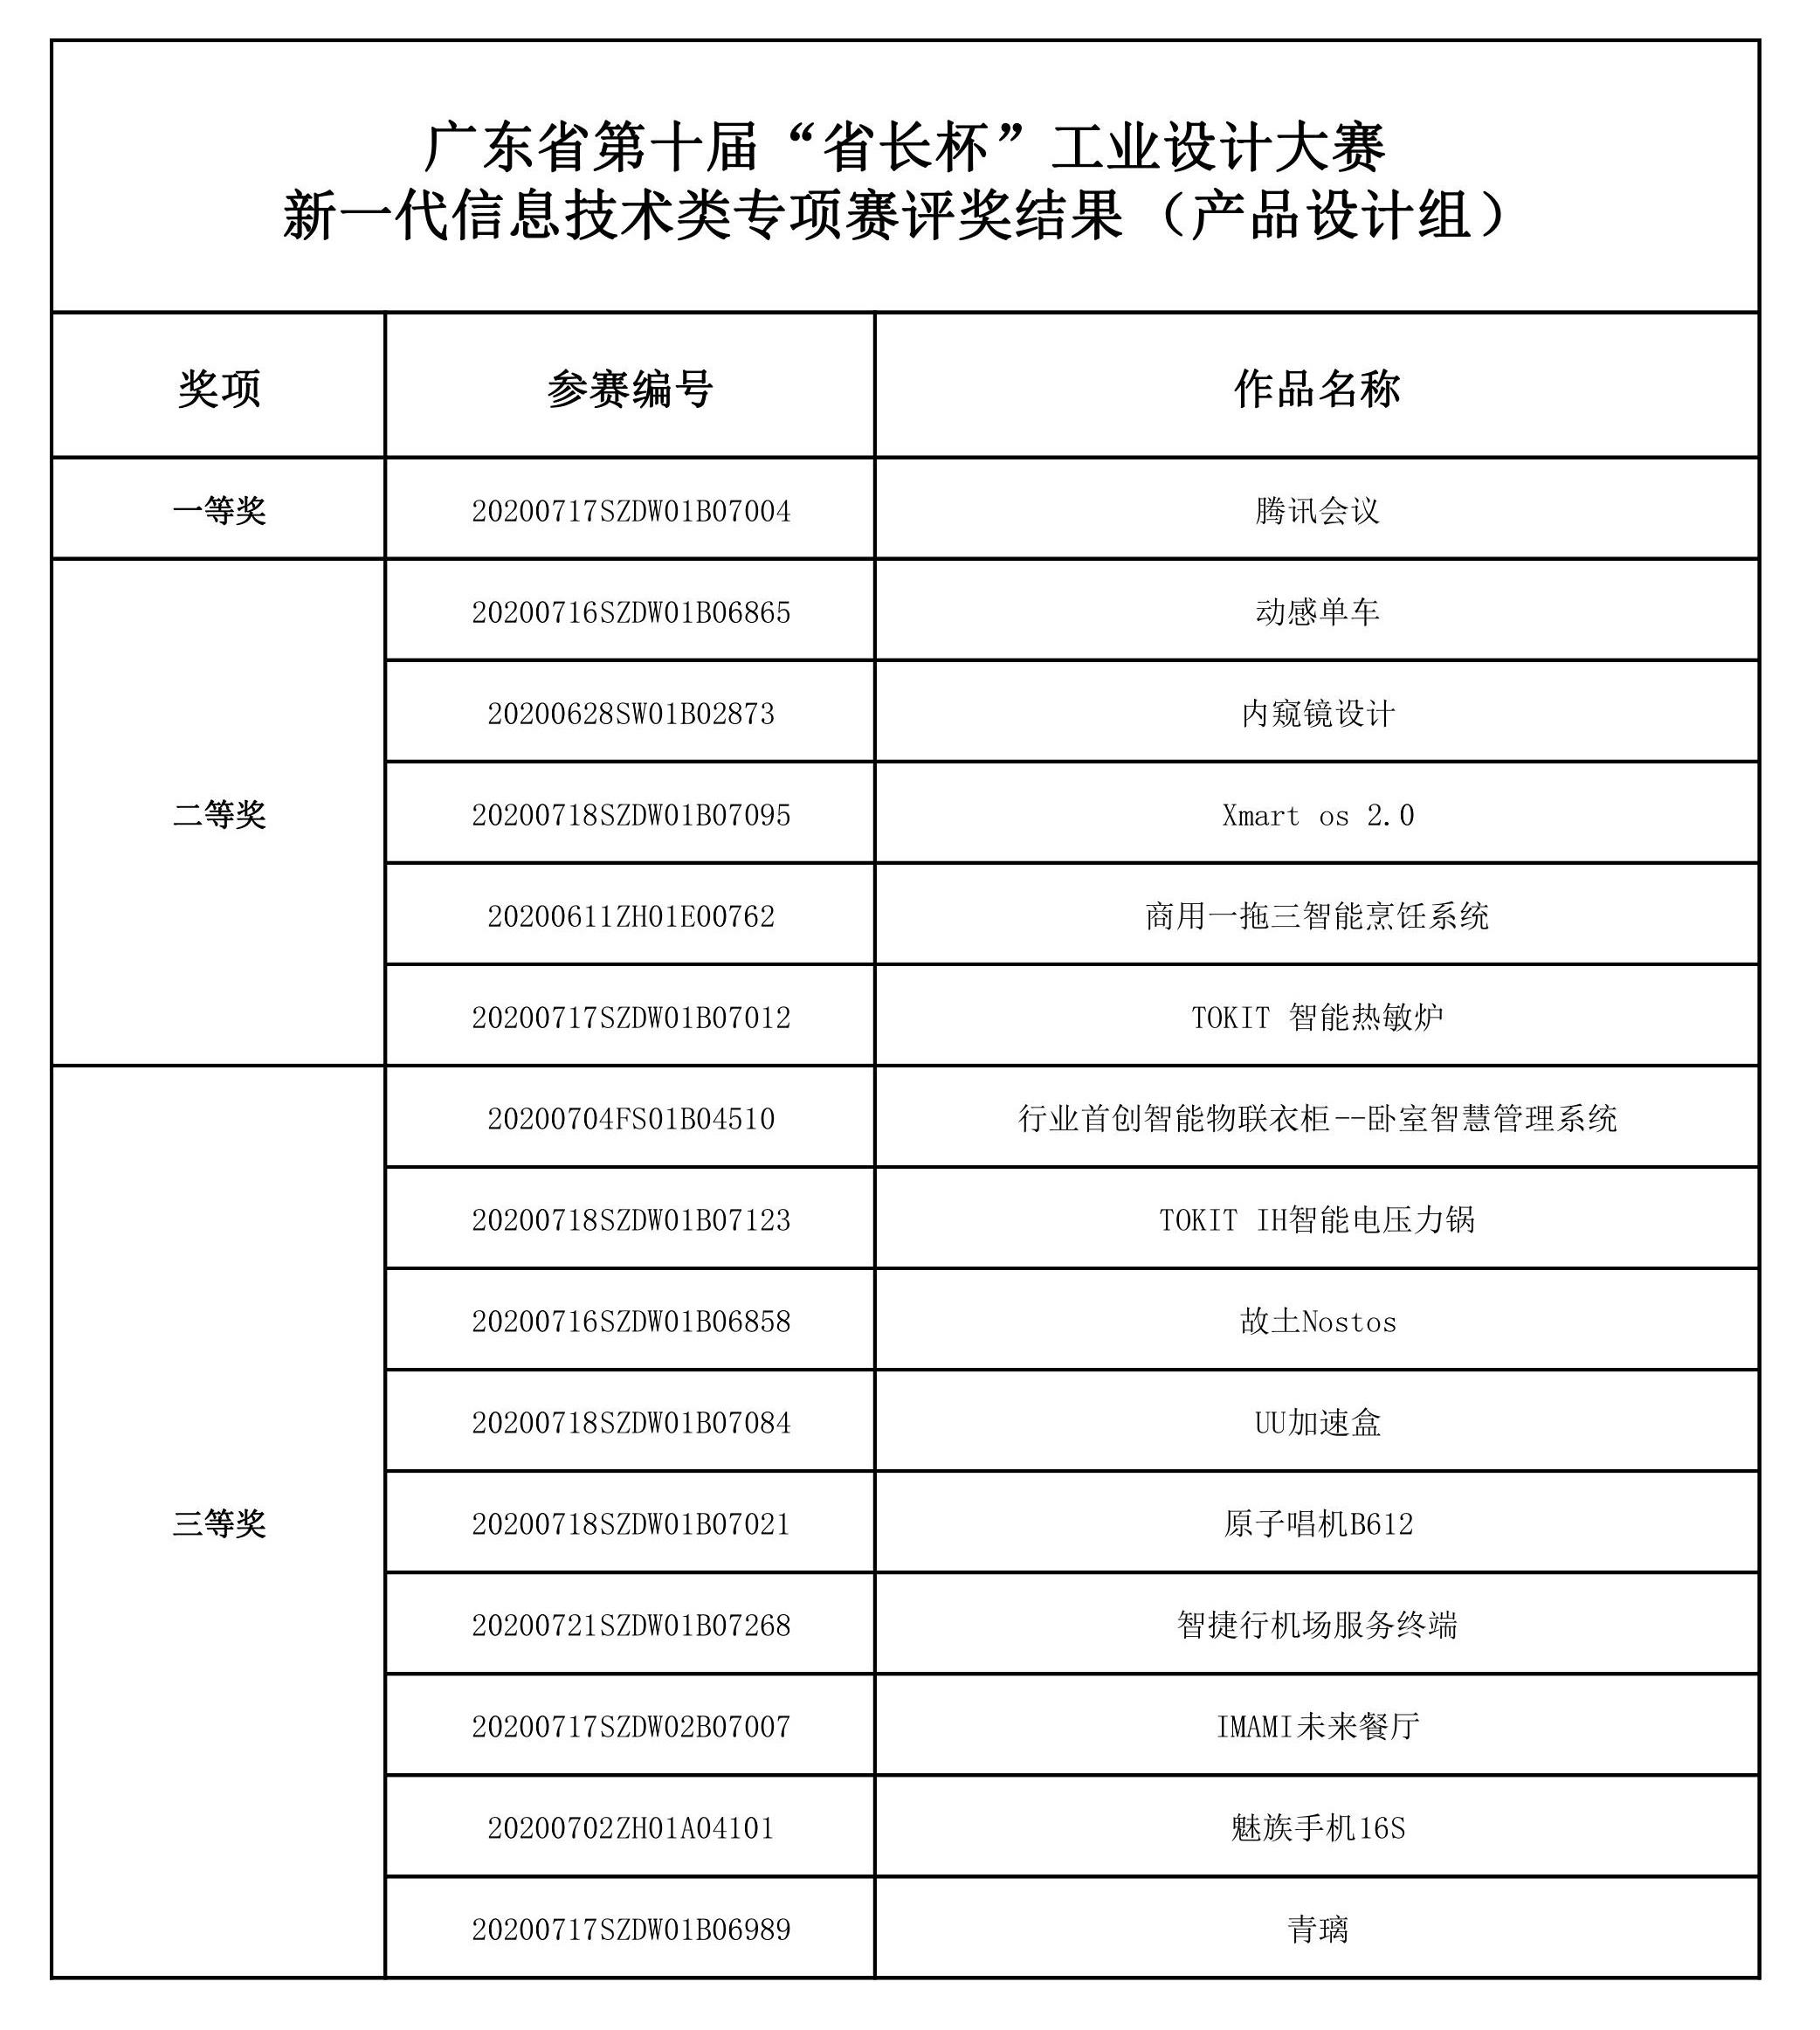 http://www.reviewcode.cn/rengongzhinen/160840.html